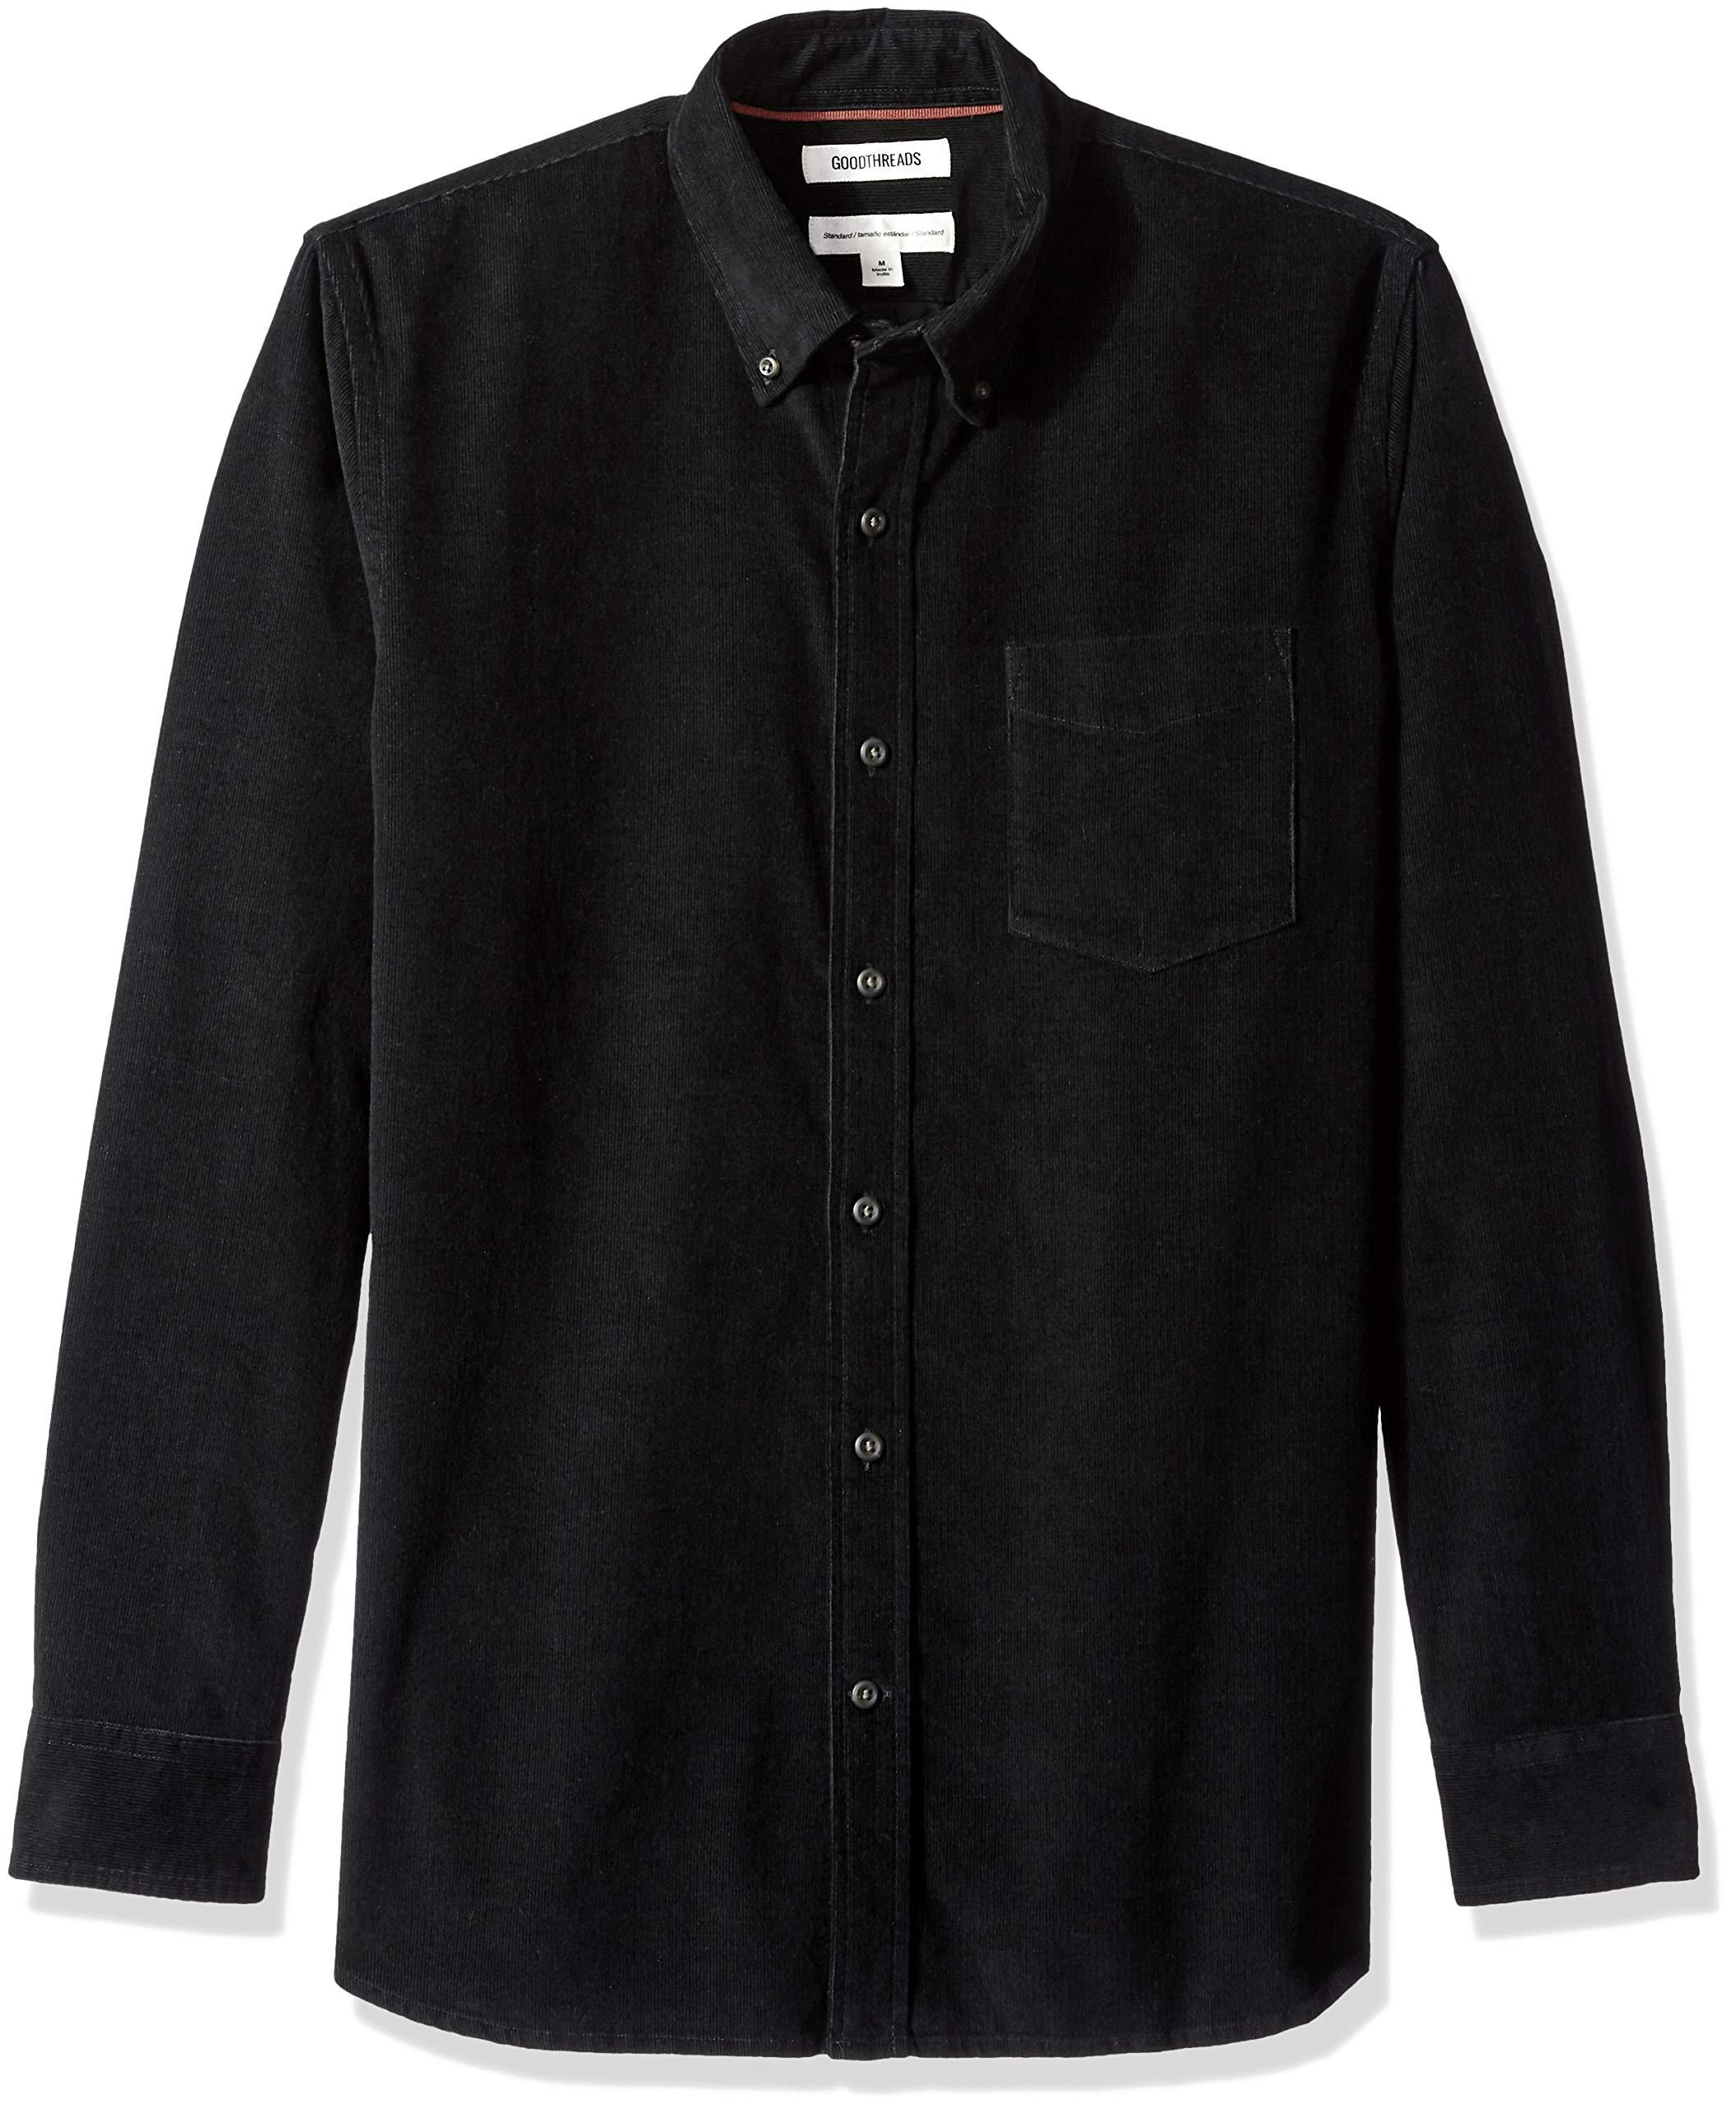 973fc9315c9ab1 Goodthreads Camicia a Maniche Lunghe in Velluto a Coste Standard Fit Uomo  product image